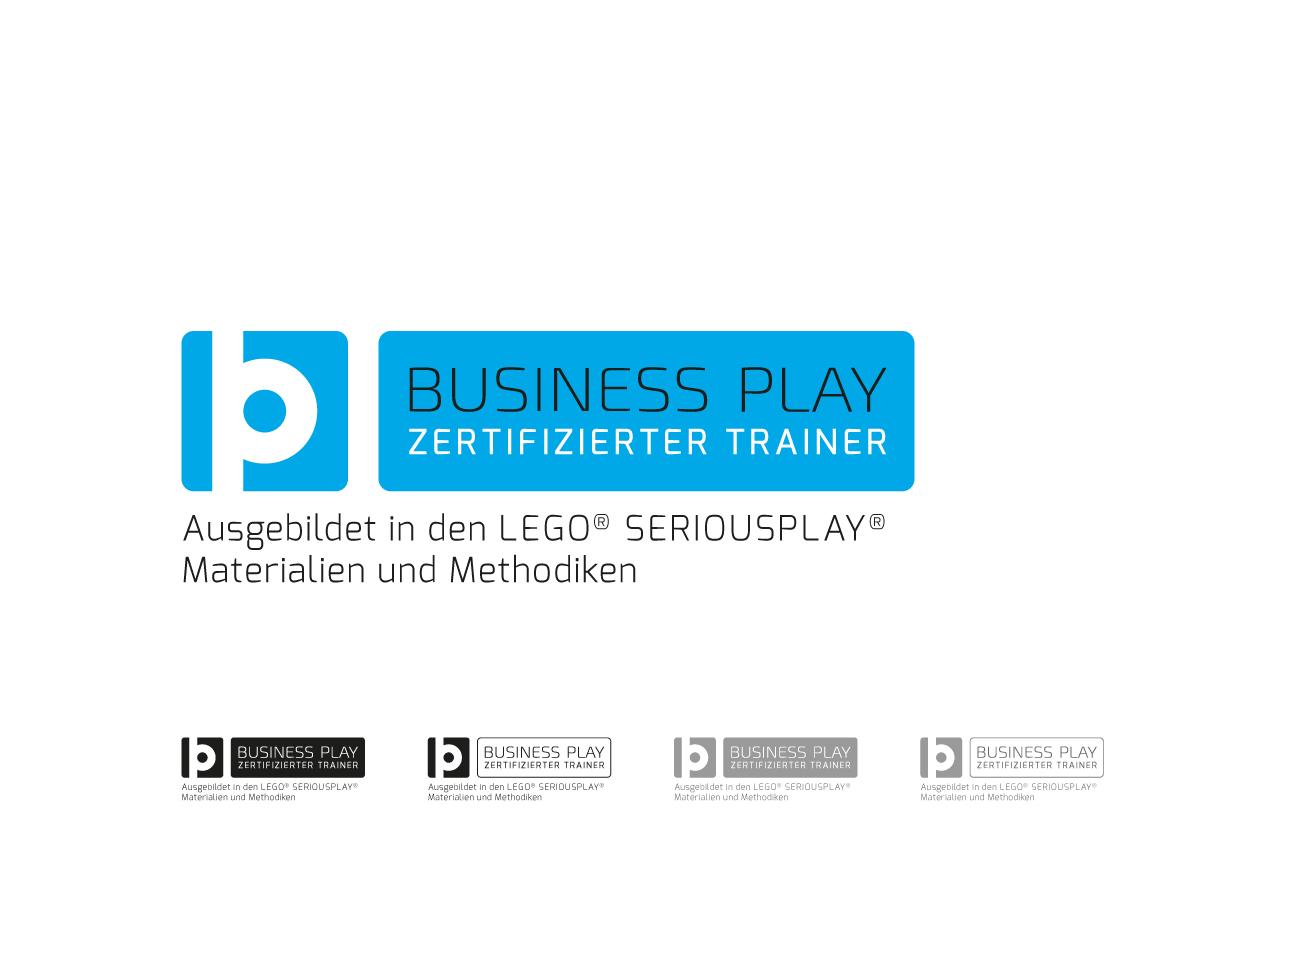 martin zech design, corporate-design, business play, trainer badge